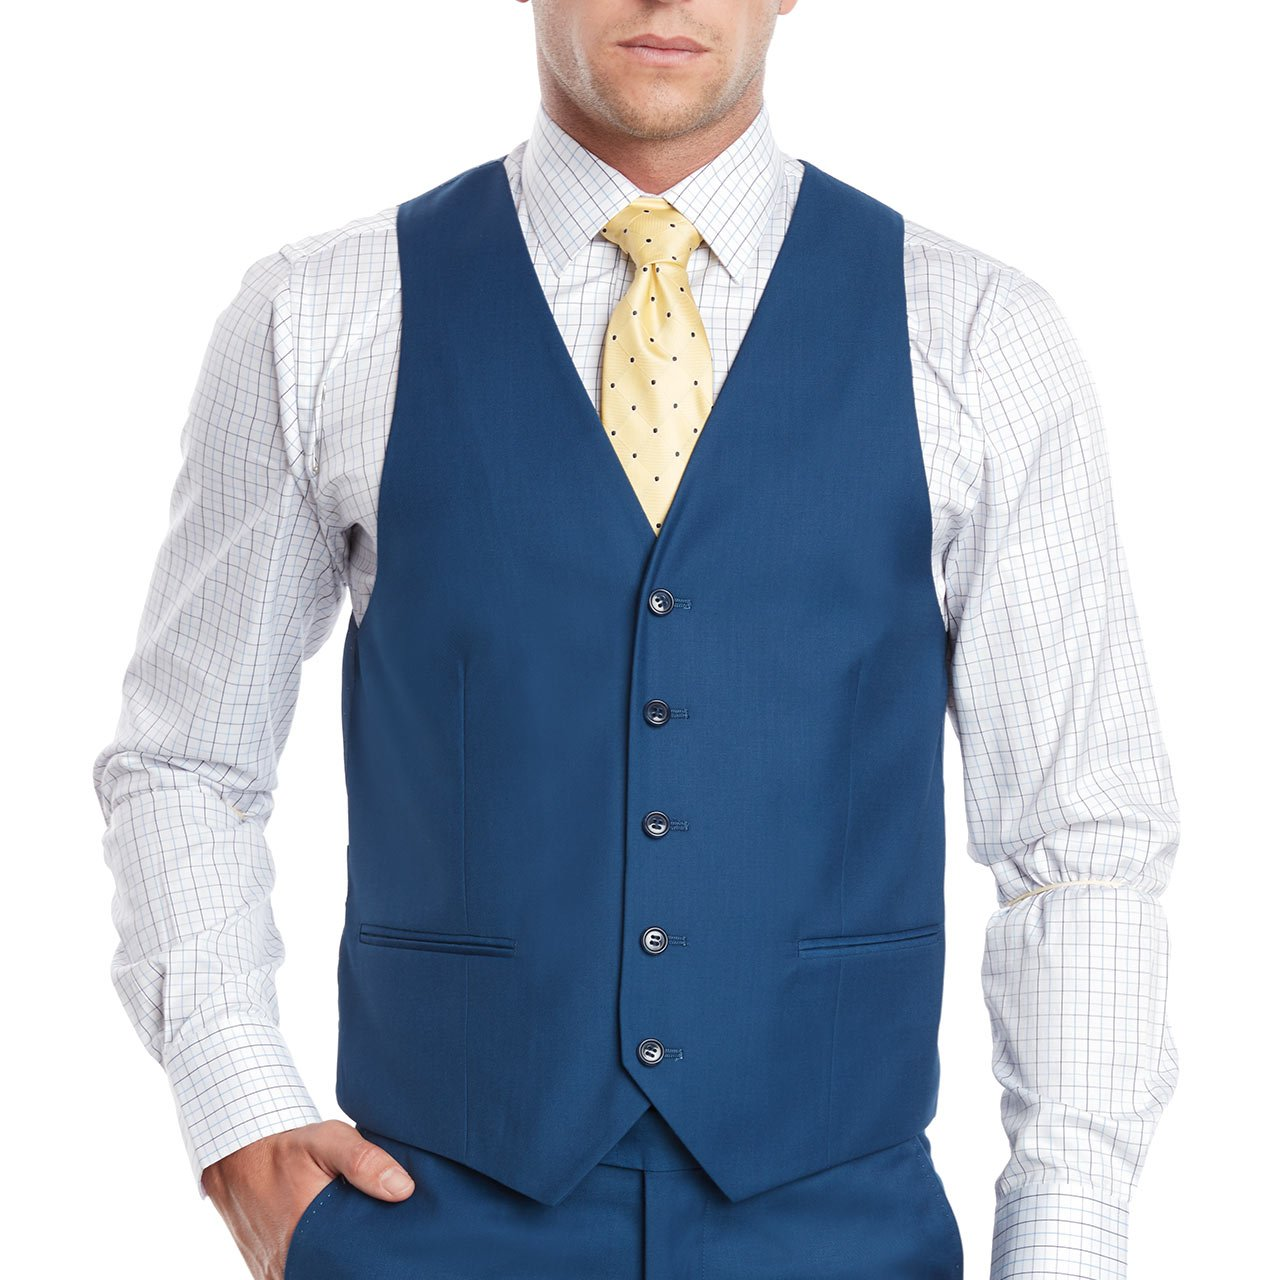 Mens Slim Fit Notched Lapel 3 Piece Suit Set Designed by Taheri French Blue 80/20(US 36R / EU 46R / Waist 30) by Sebastian Taheri Uomo (Image #3)